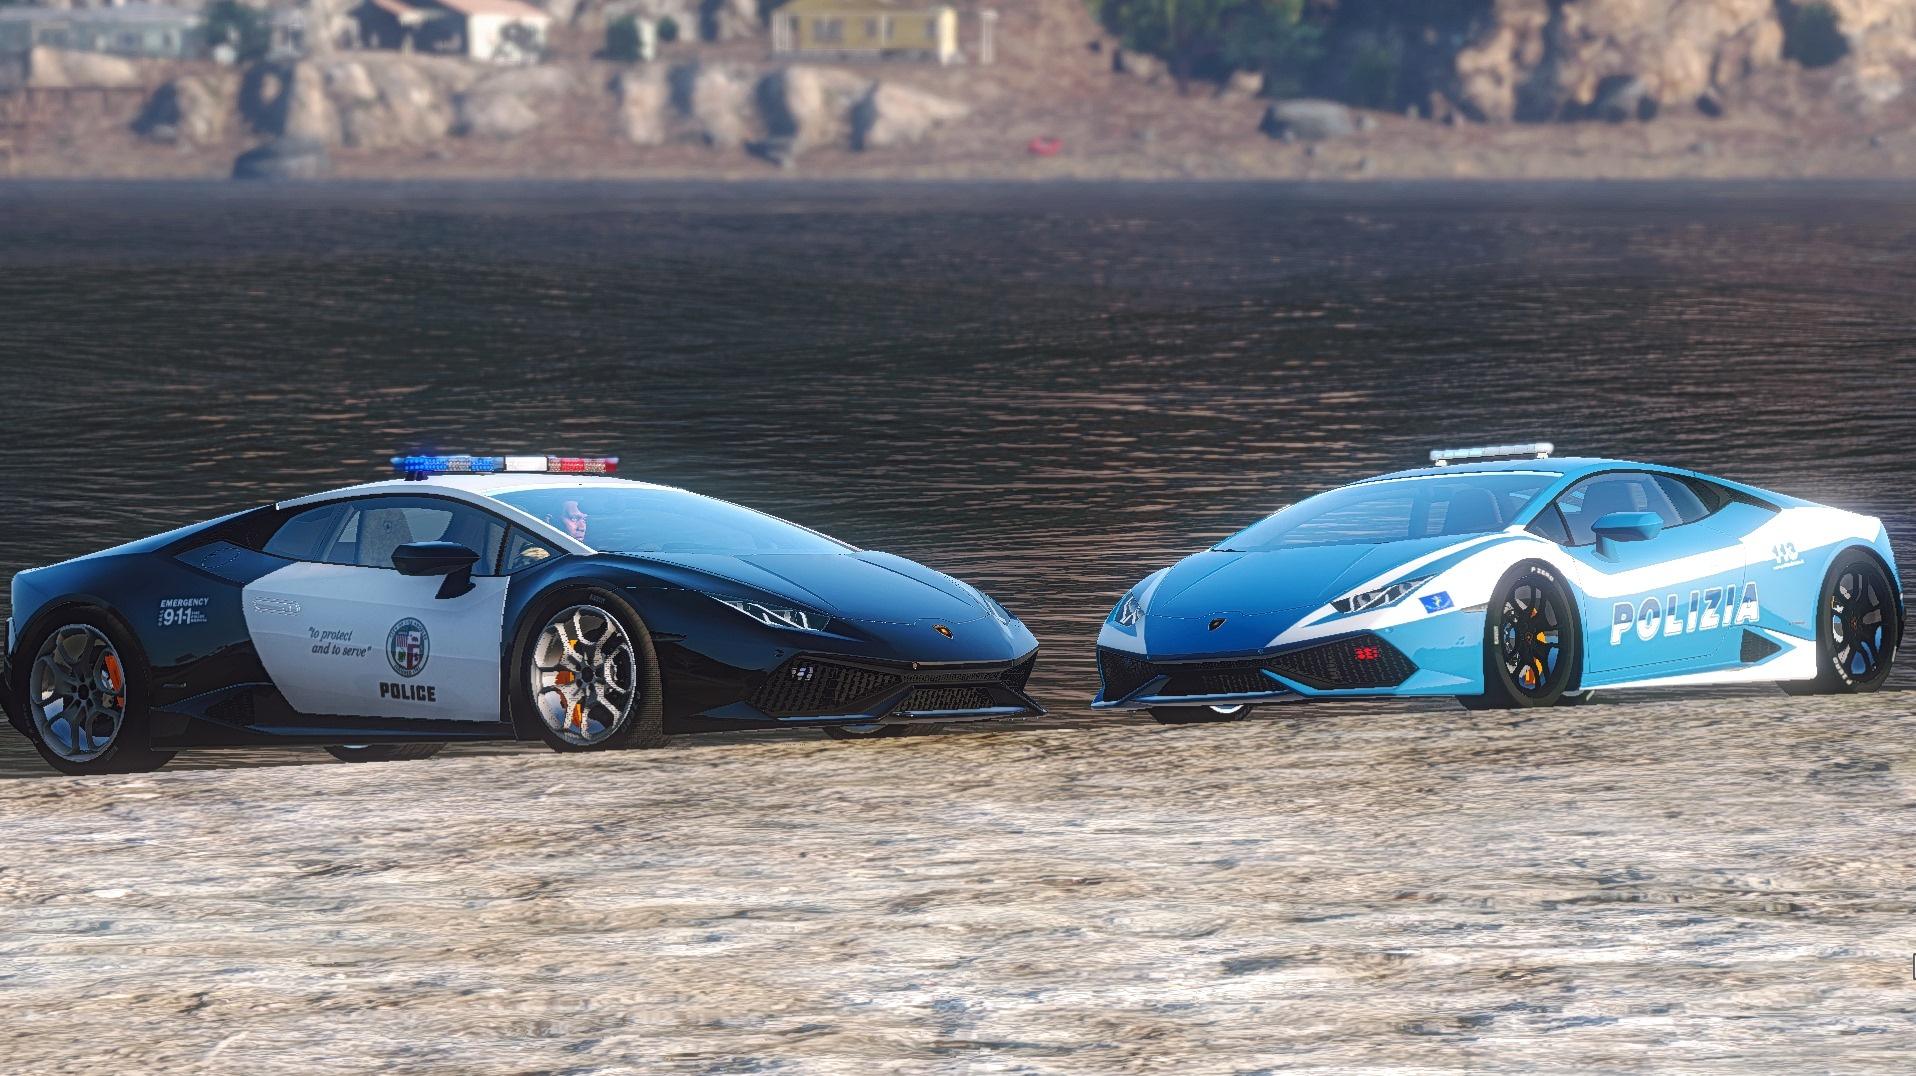 Lamborghini Huracan Italian Police And Lapd Template Gta5 Mods Com